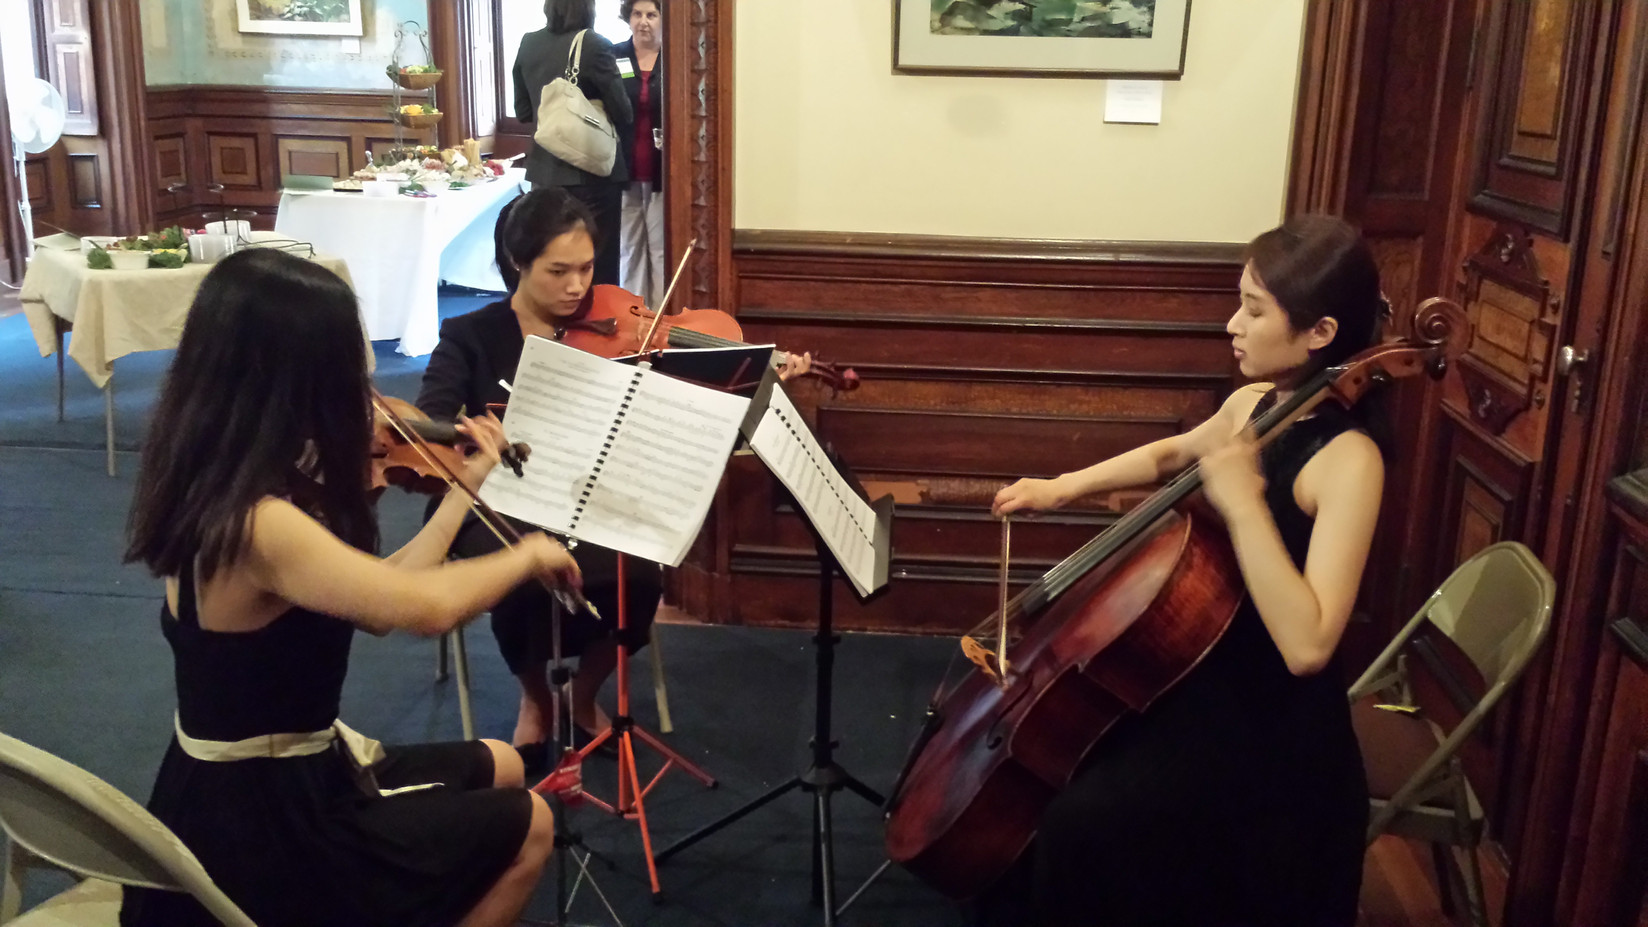 Girls-Electric-Violinist.jpg